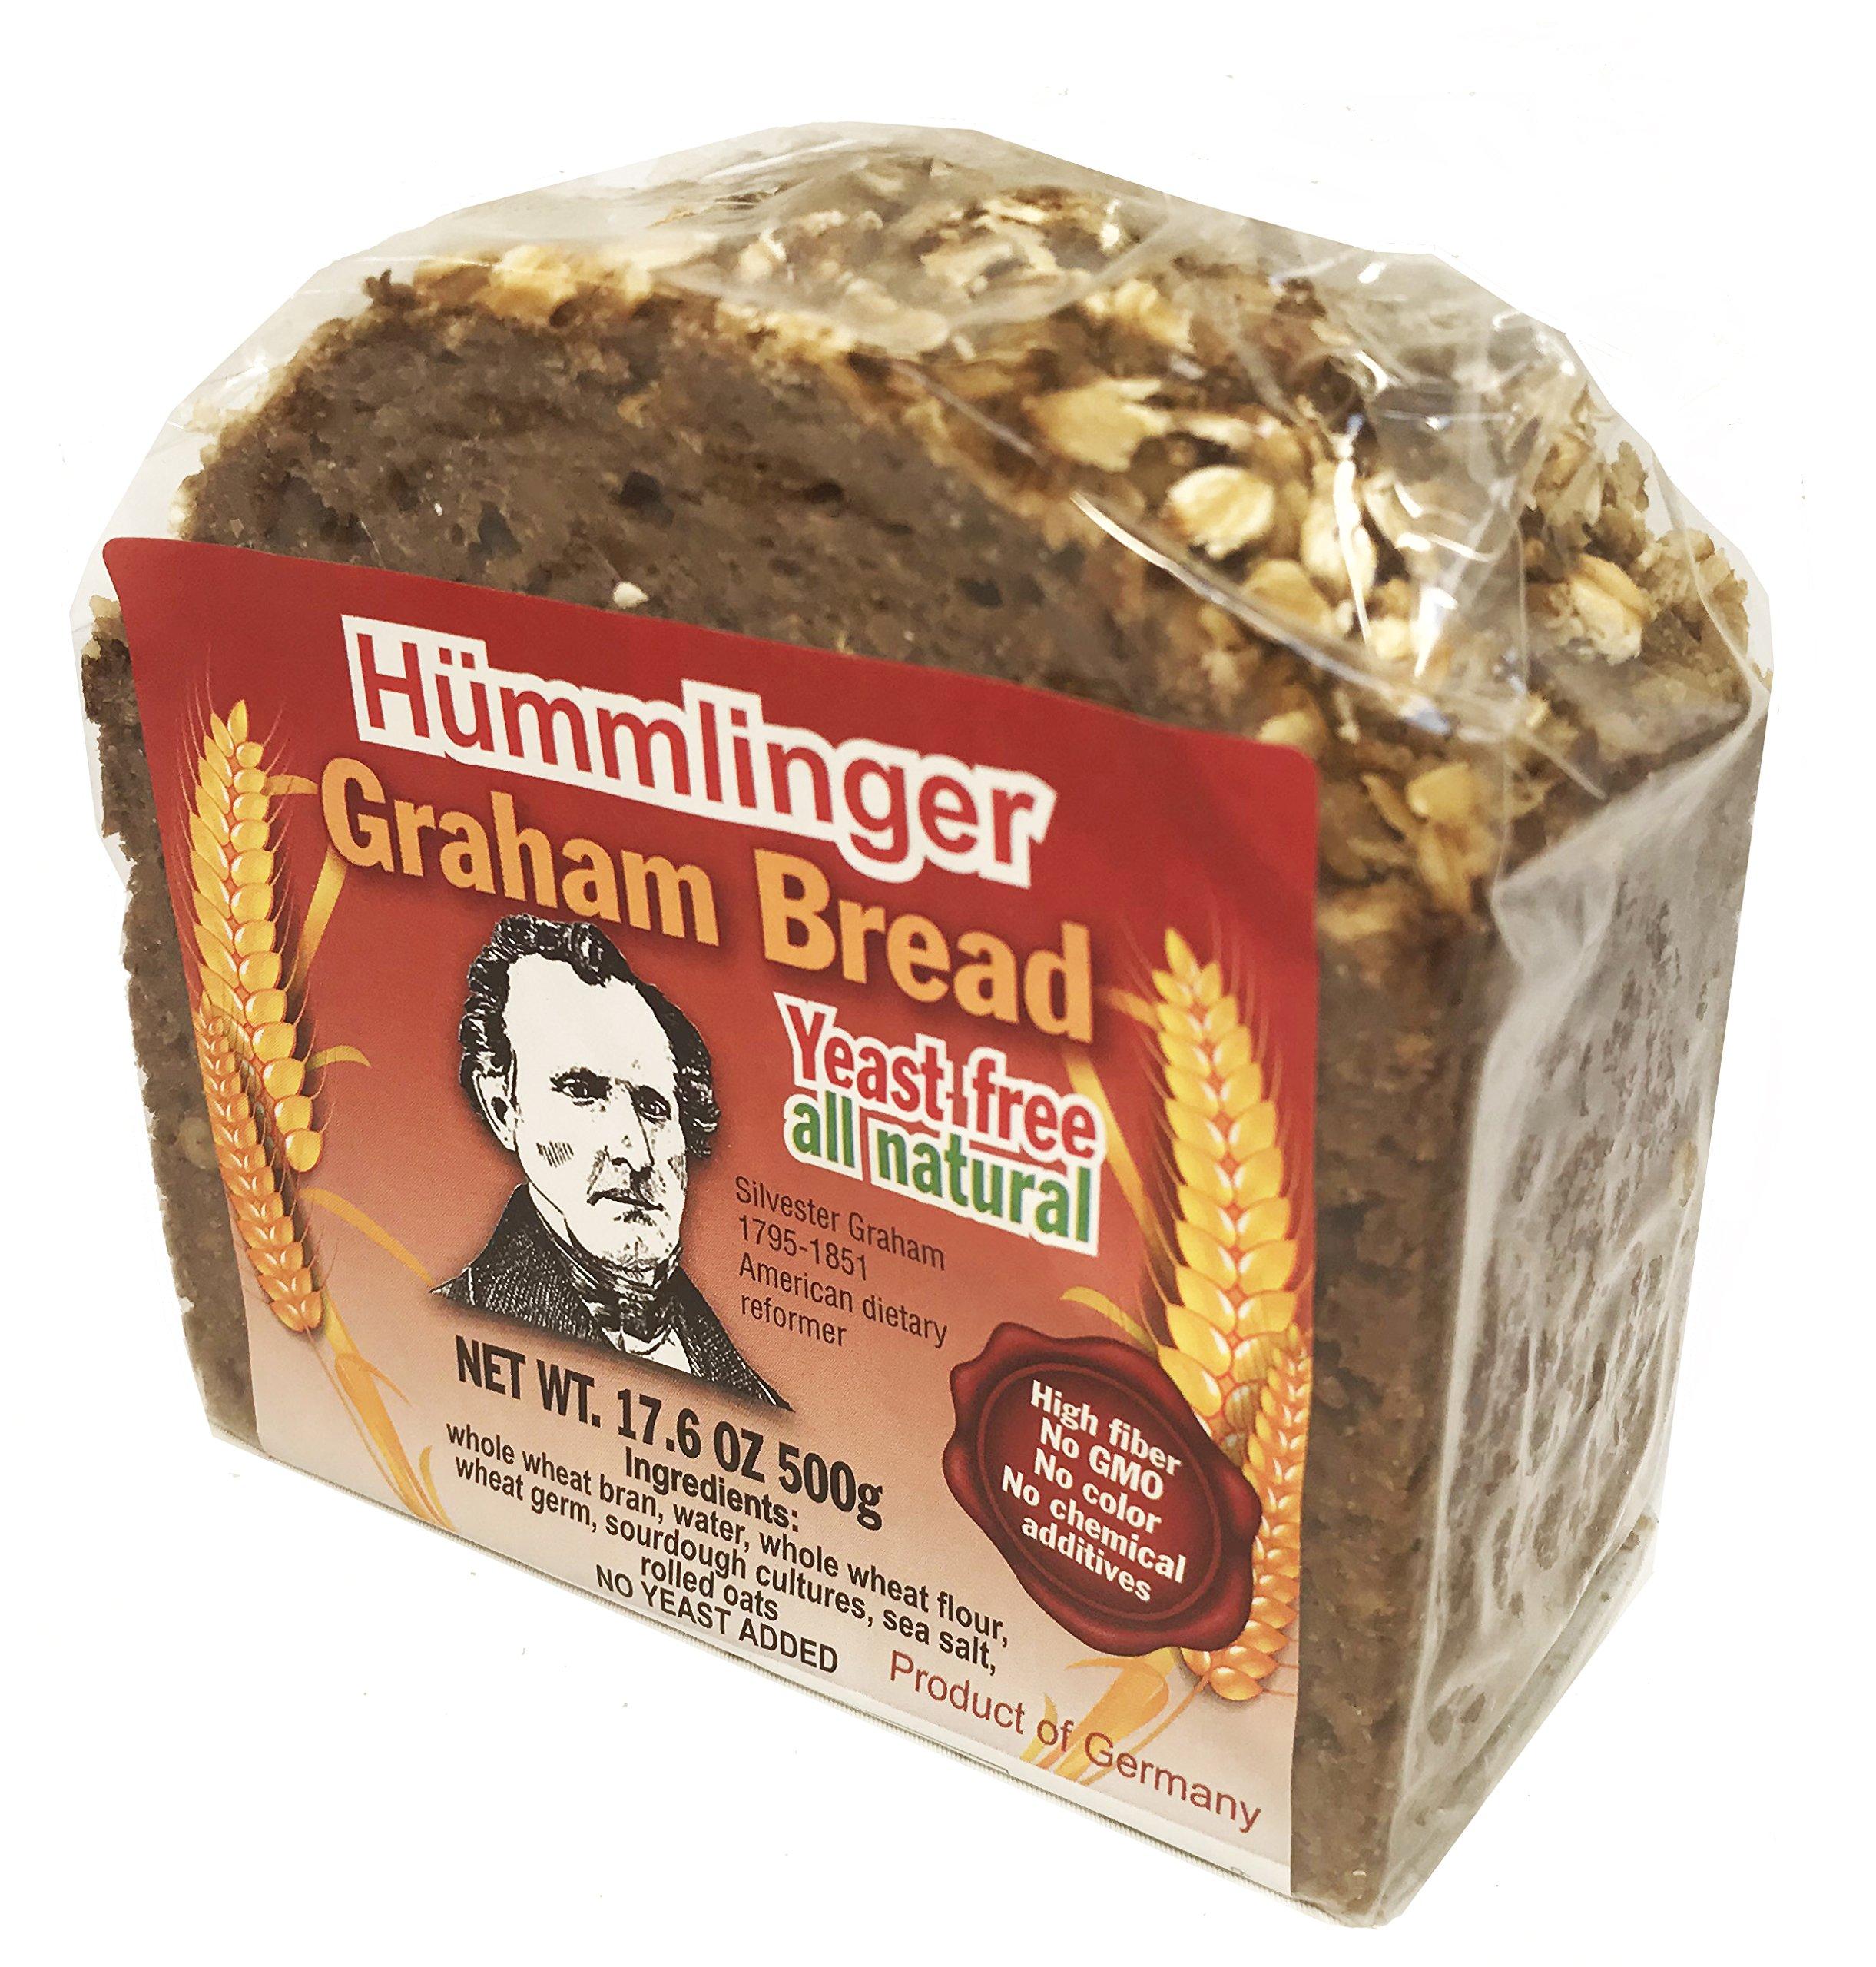 Hummlinger Yeast Free Graham Bread, GMO FREE 17.6oz (6 packs)